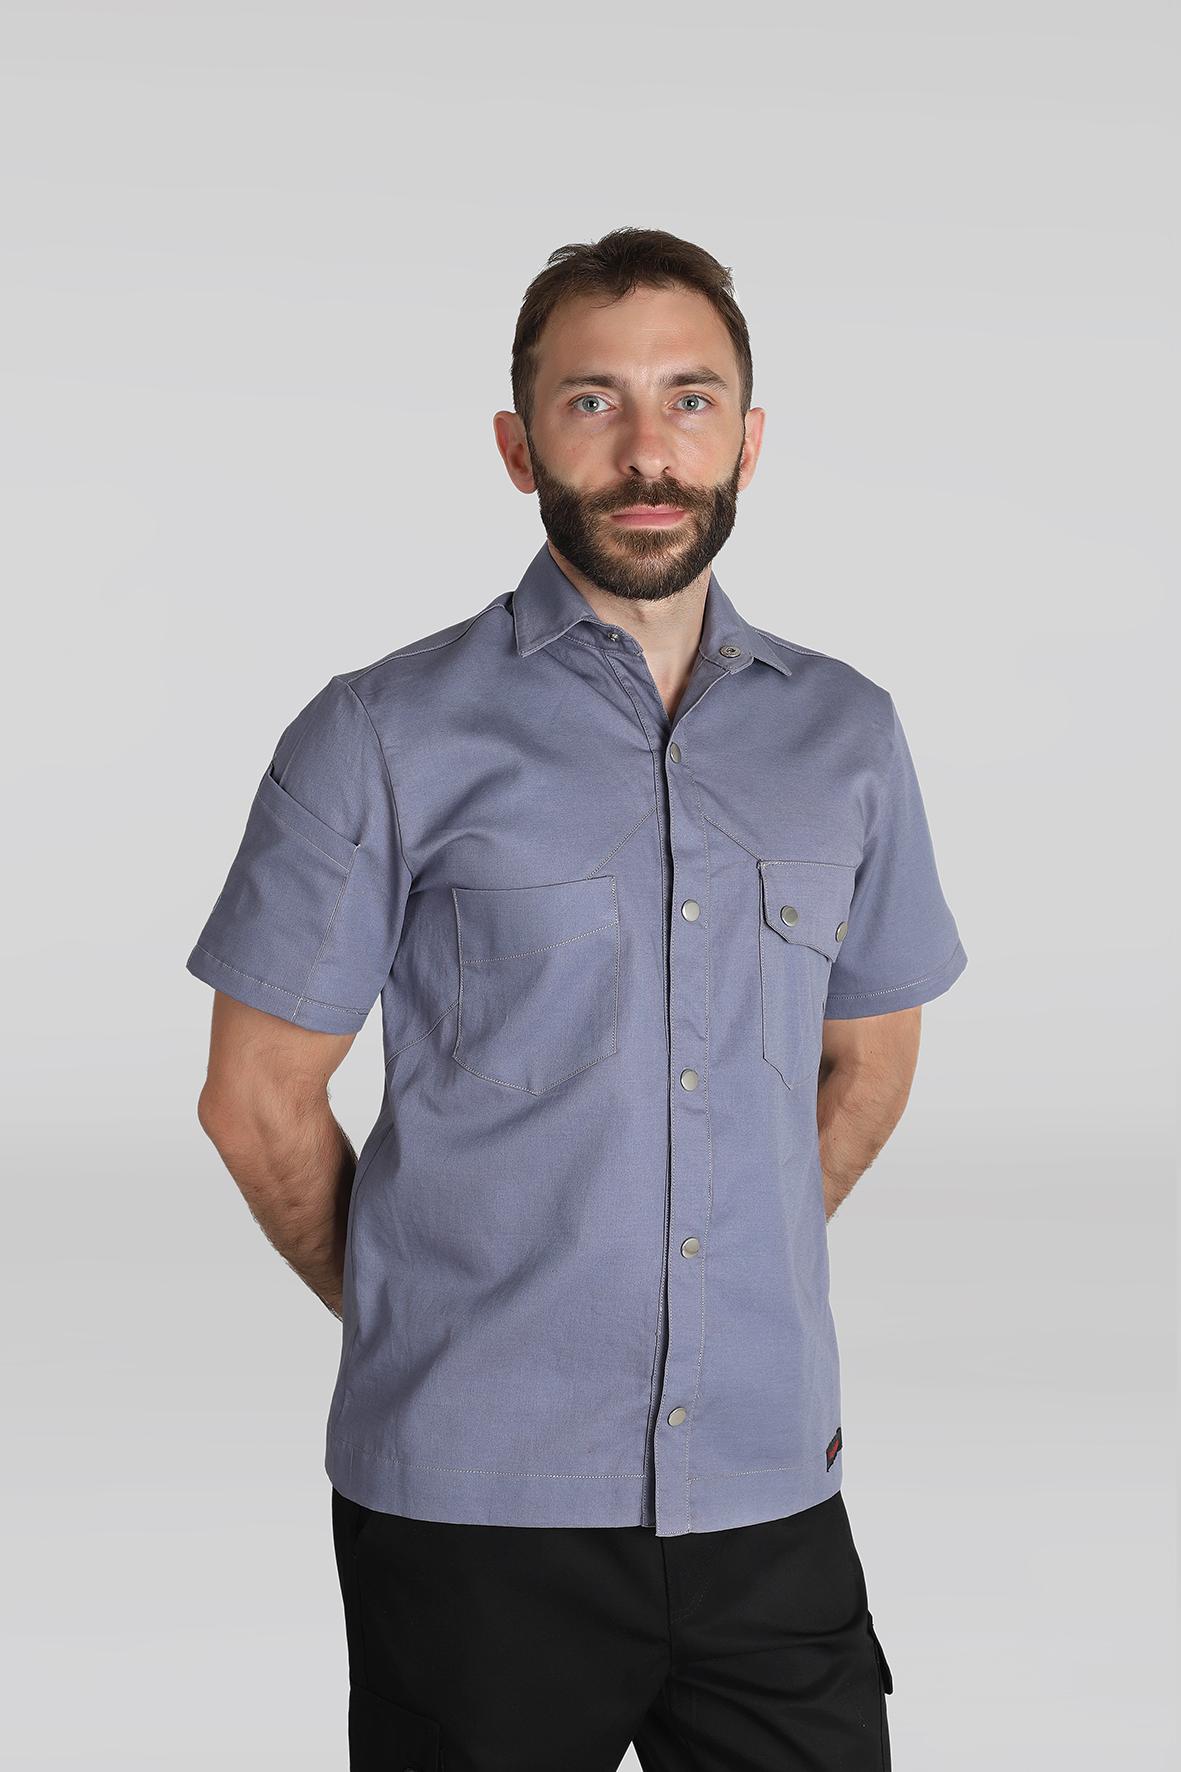 camisas para uniformes gastronómicos